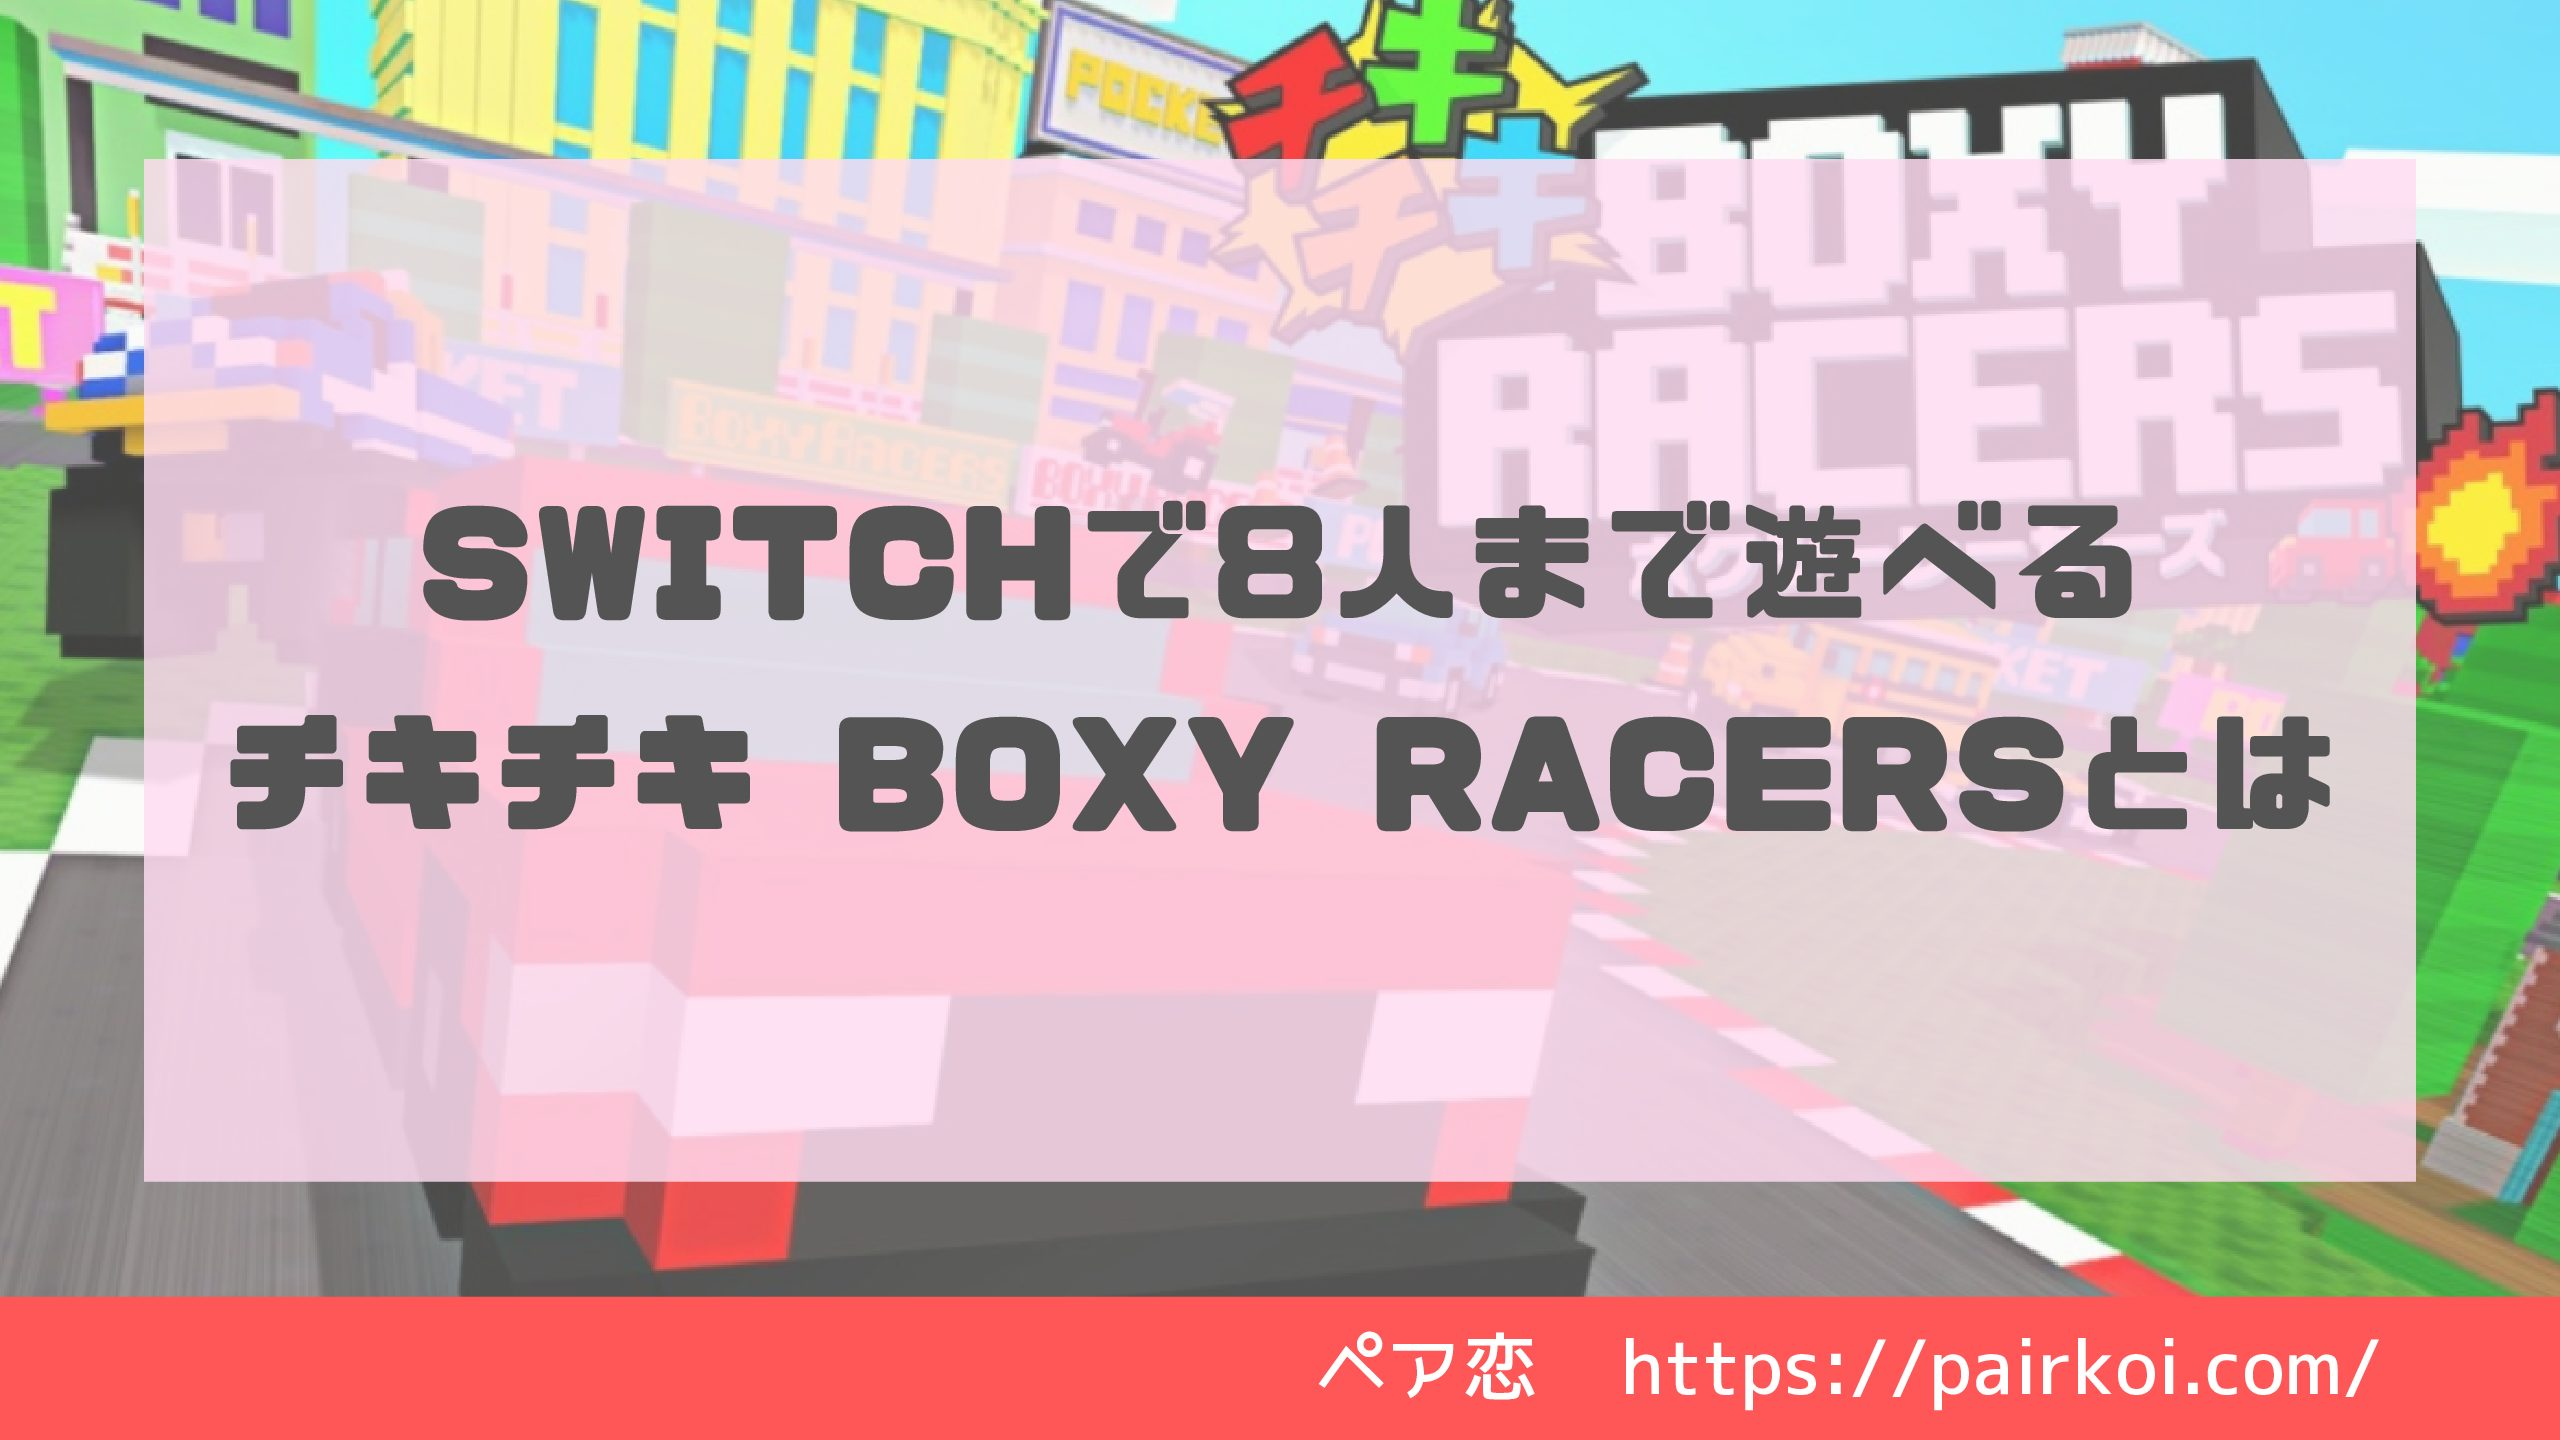 Switchで8人まで遊べるチキチキ BOXY RACERSとは